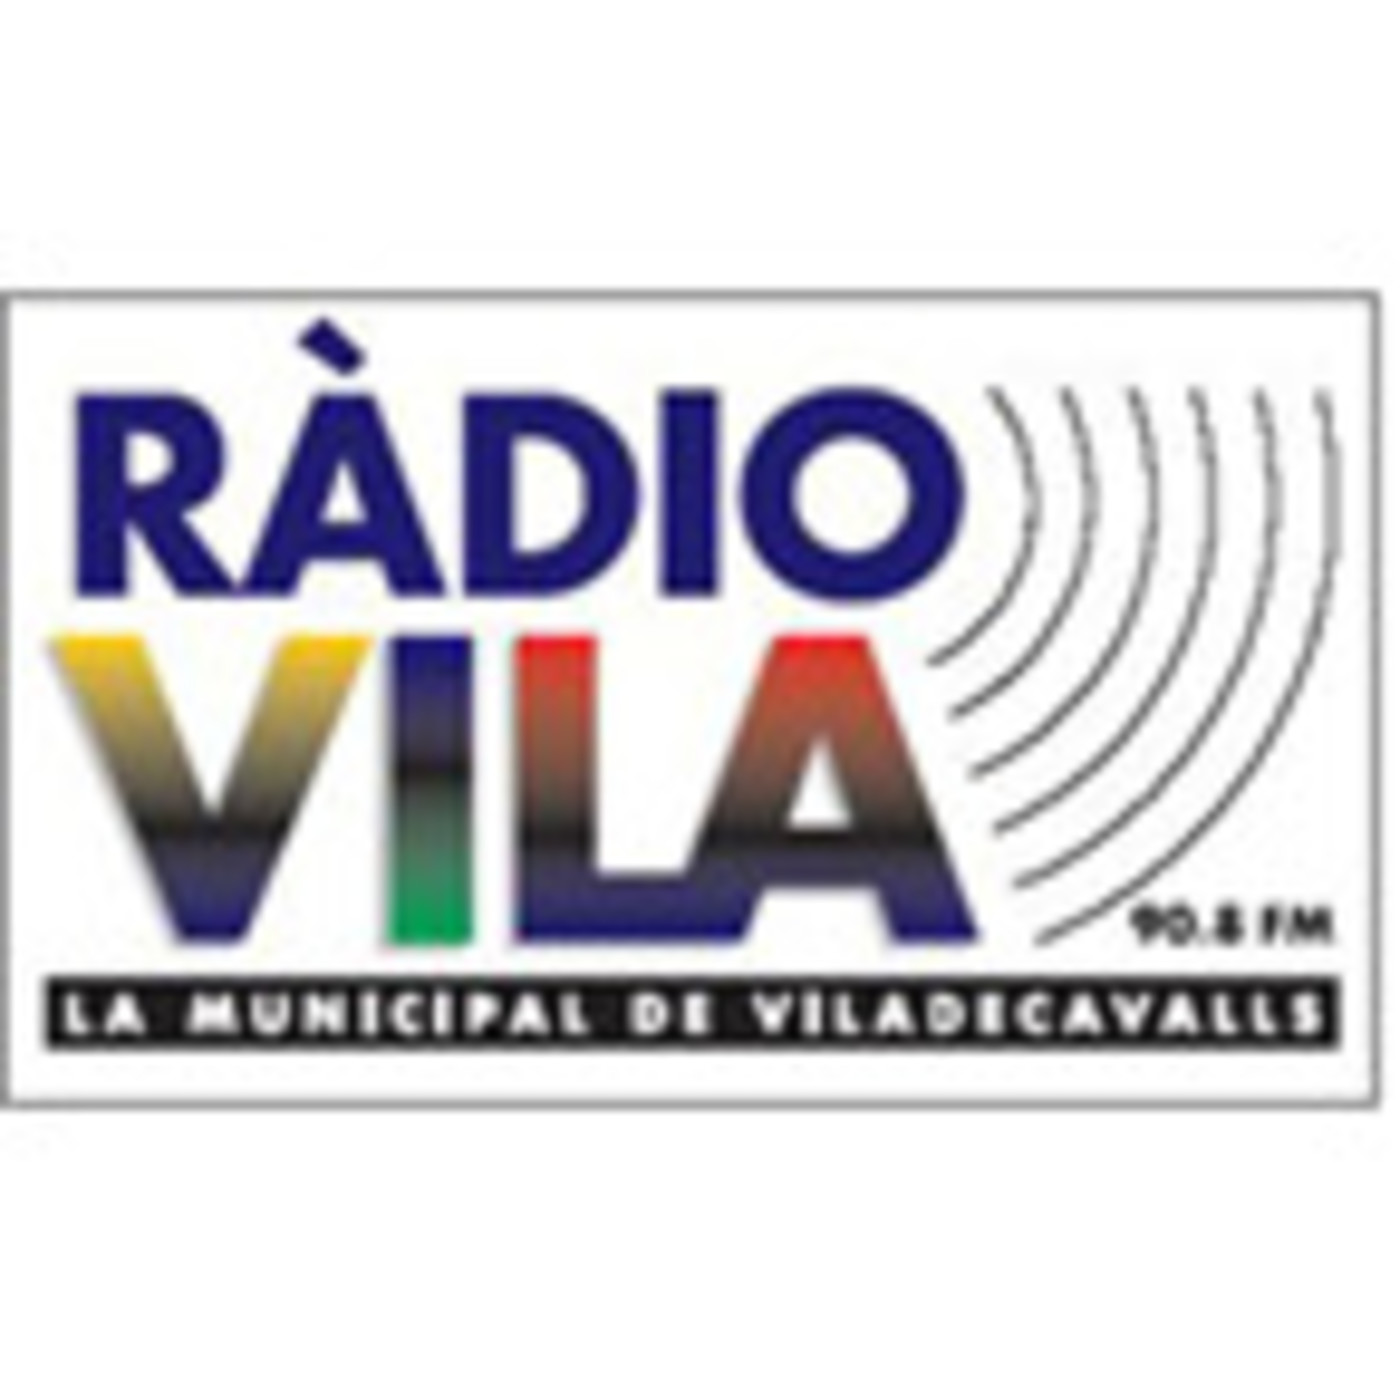 Ràdio Vila